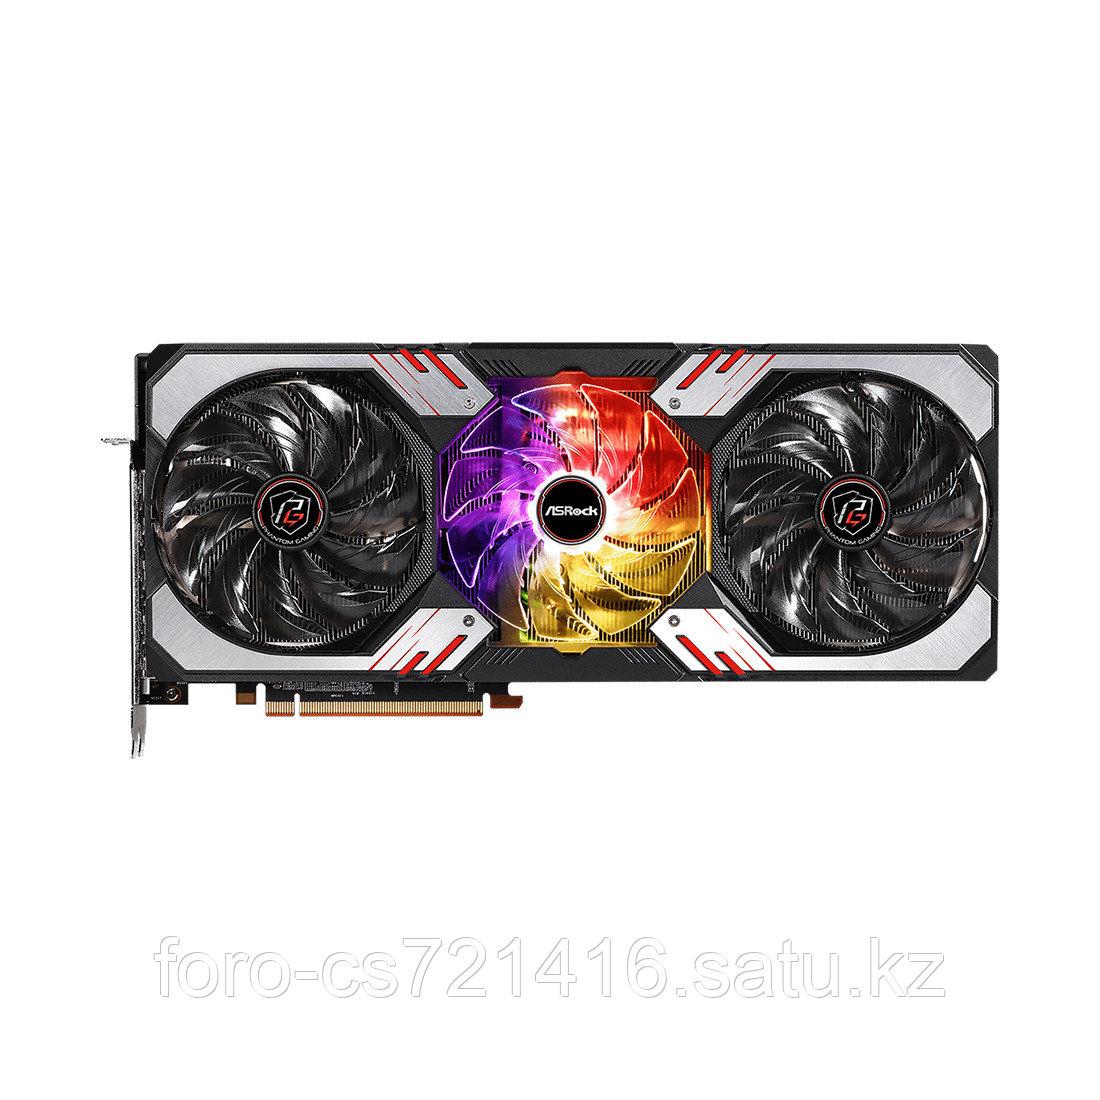 Видеокарта ASRock Radeon RX6900XT PGD 16GO